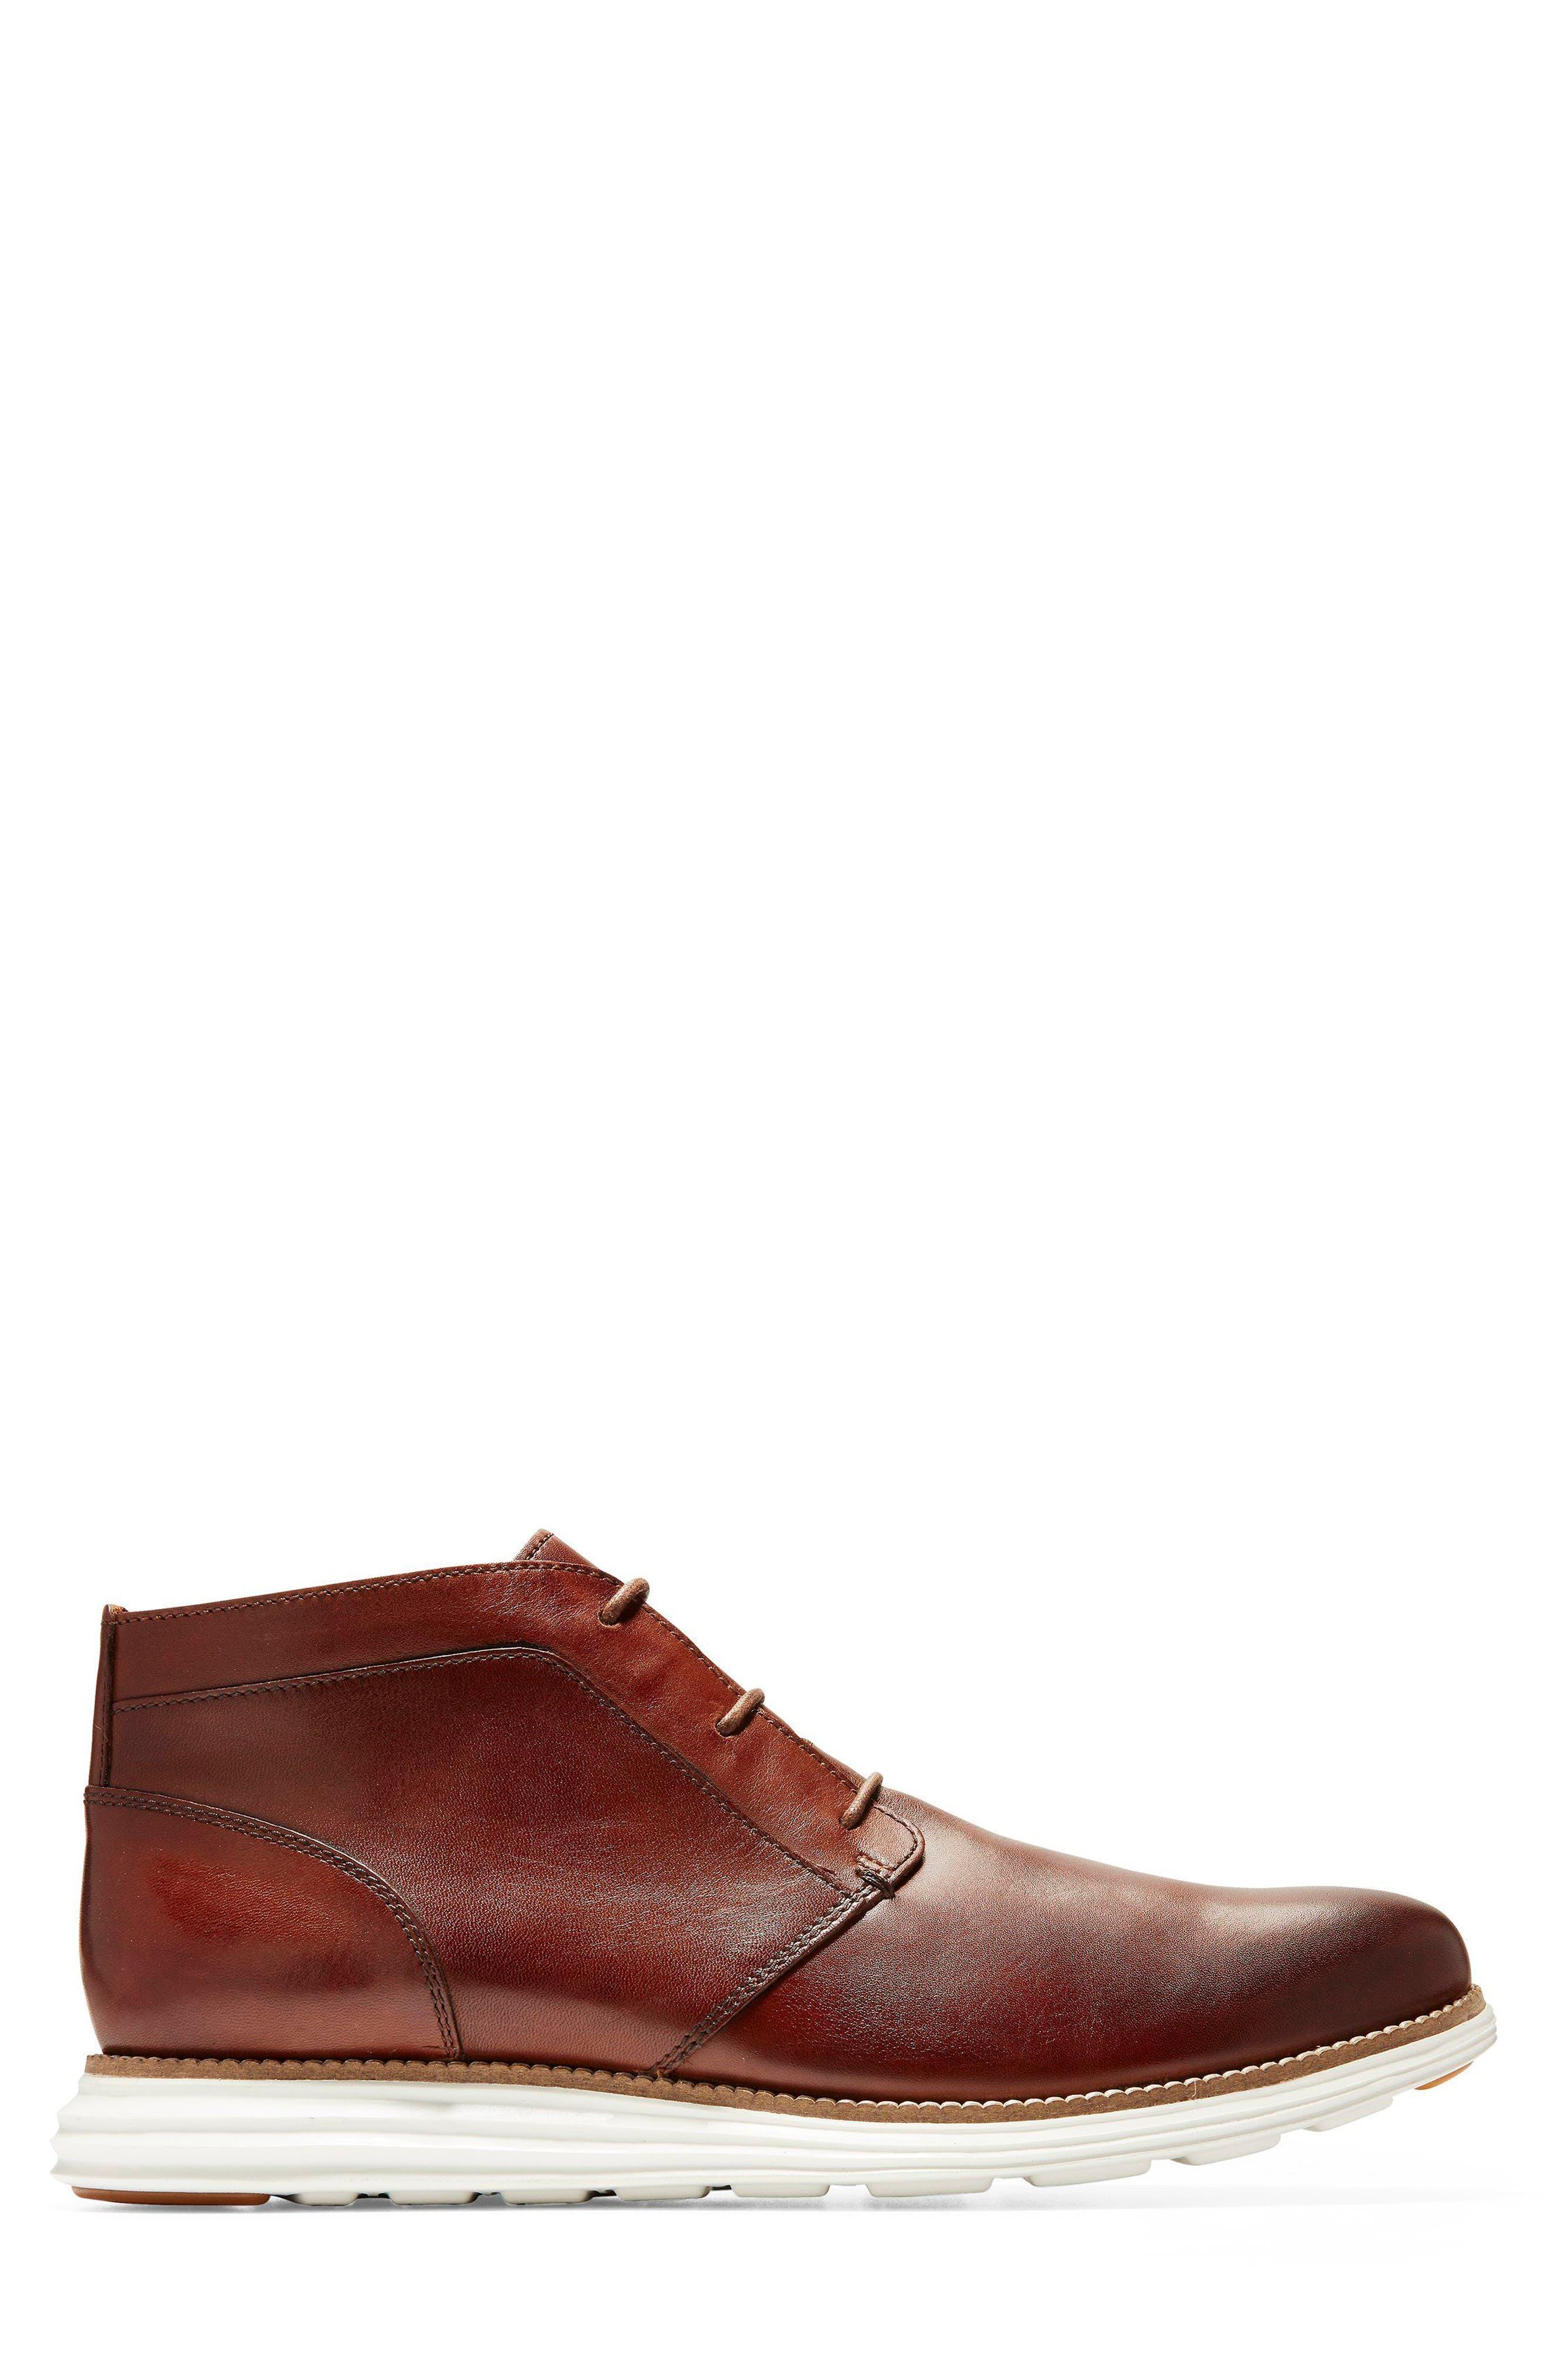 COLE HAAN, Original Grand Chukka Boot, Alternate thumbnail 3, color, 200